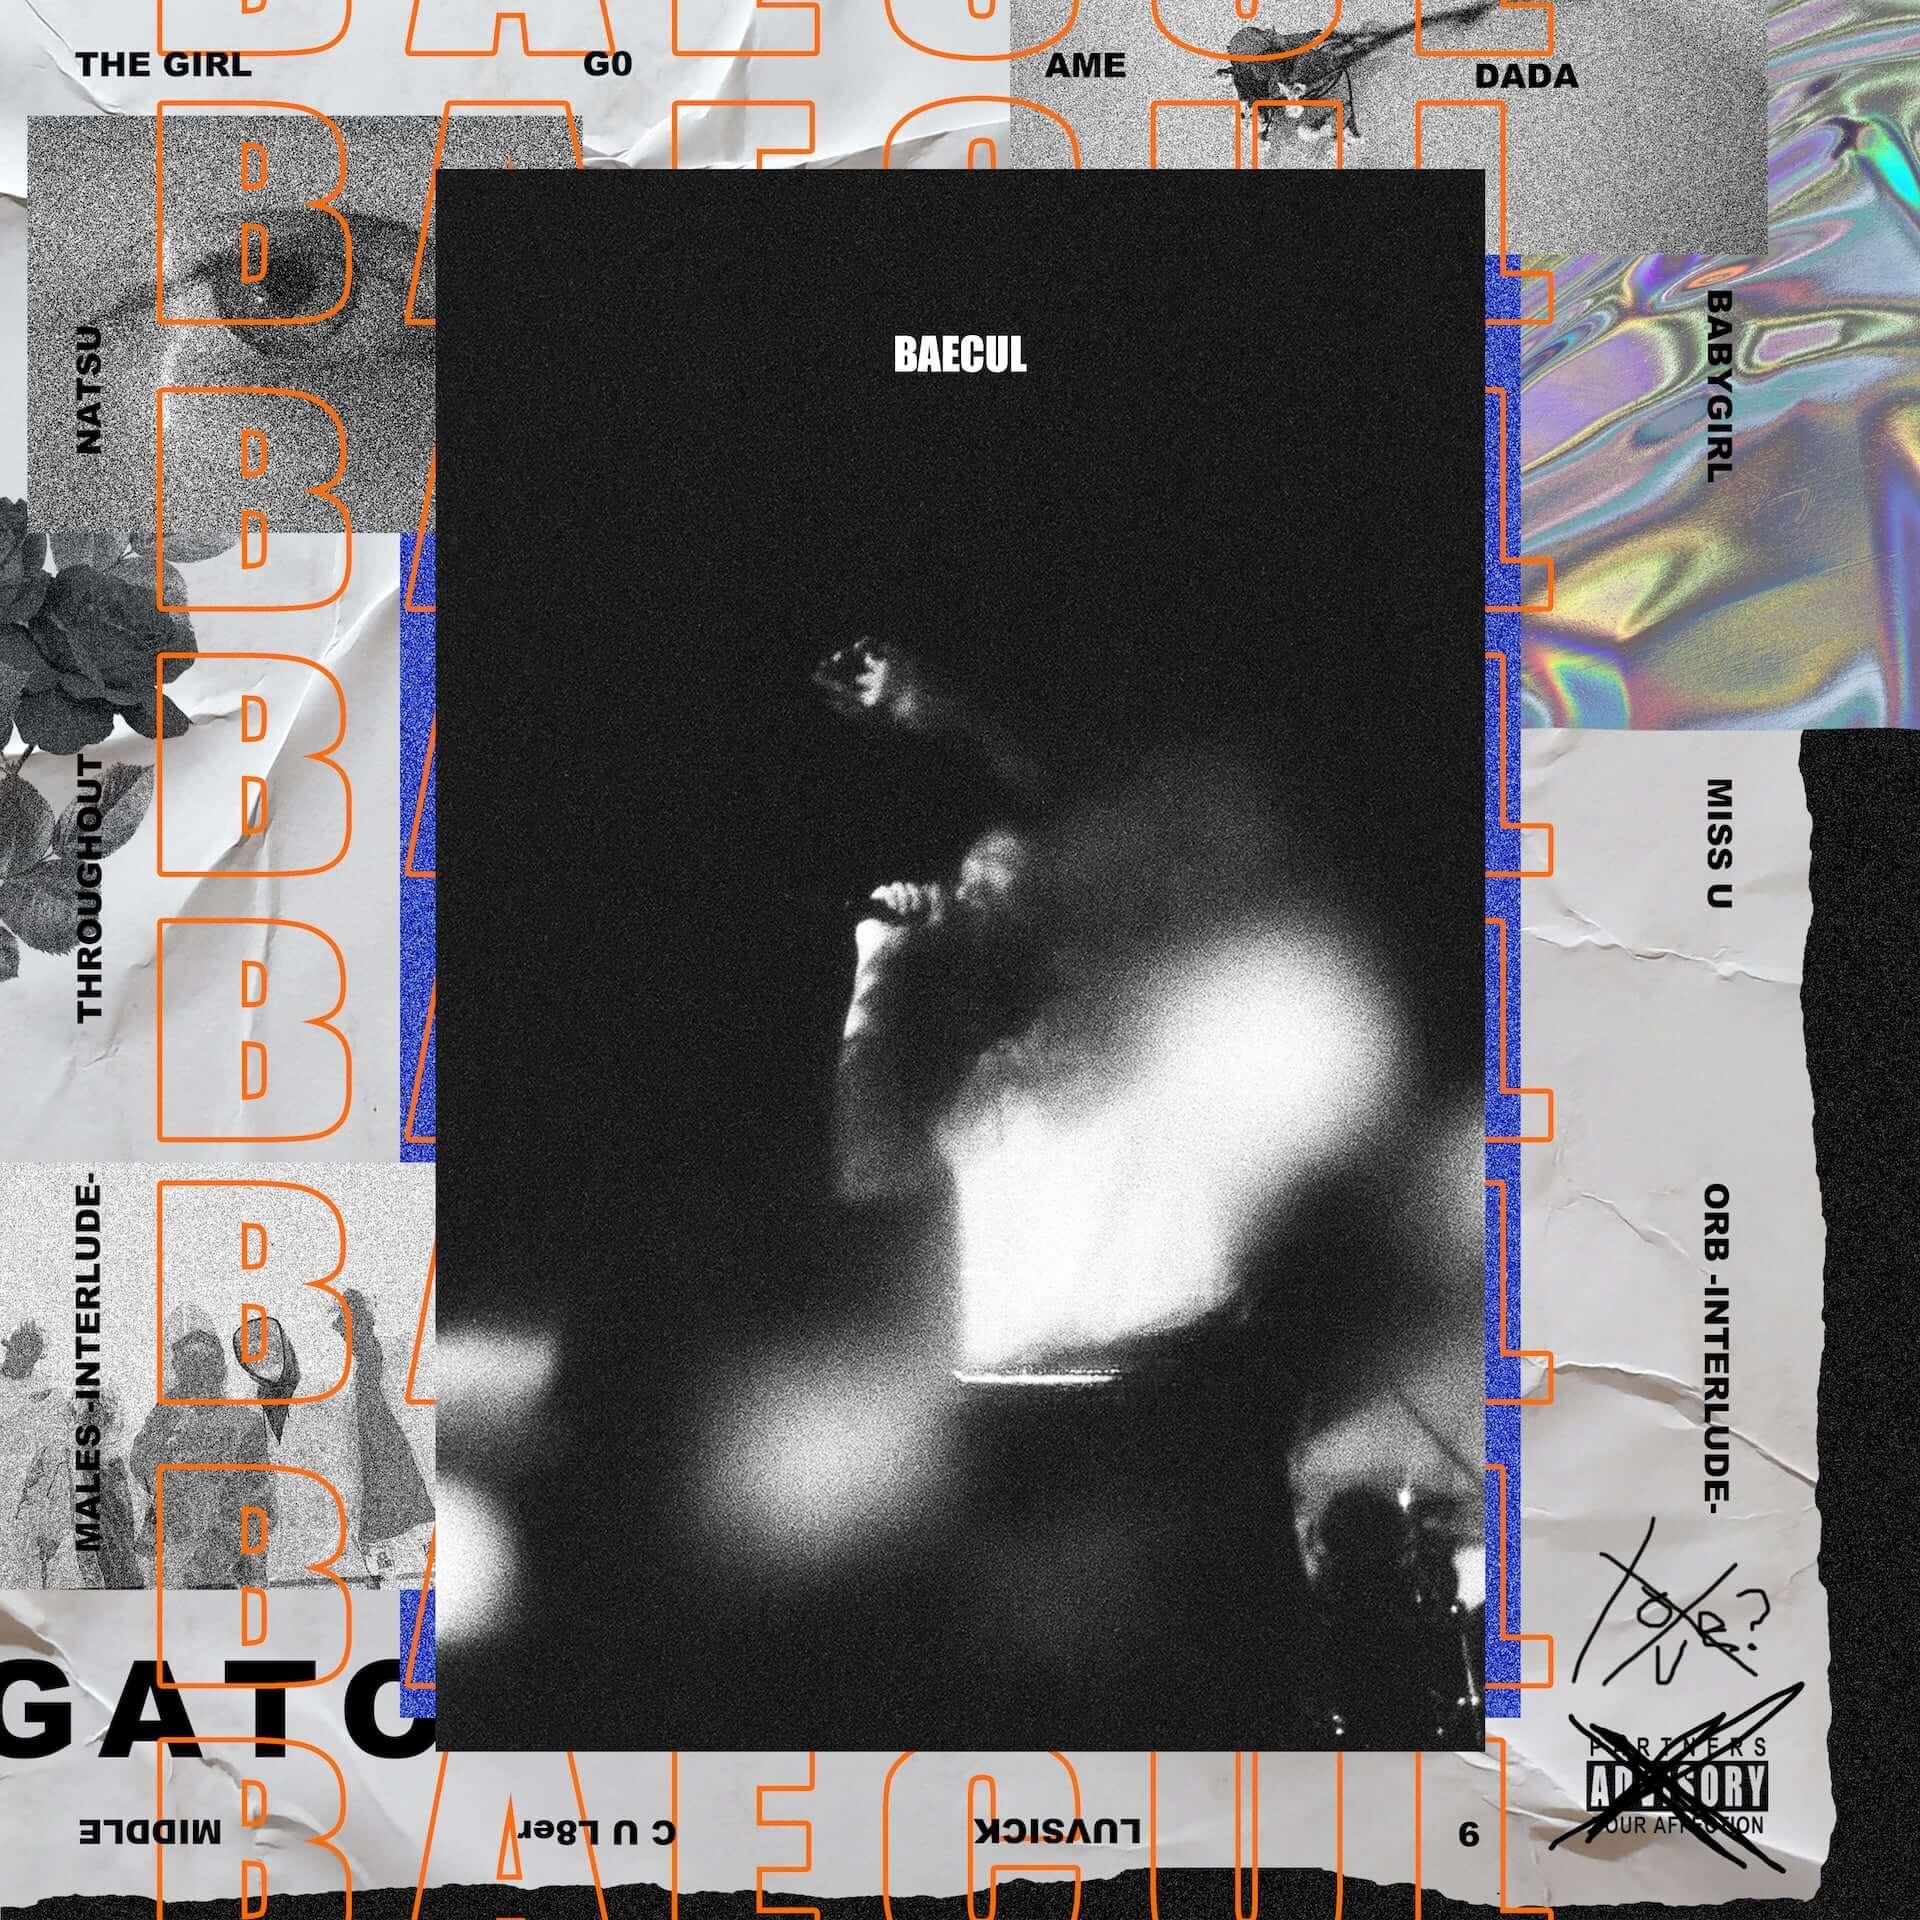 "gatoの1stアルバム『BAECUL』と""miss u""MV、最新アー写が本日解禁!渋谷WWWでのリリパにはNo Busesが出演決定 music201014_gato_1-1920x1920"